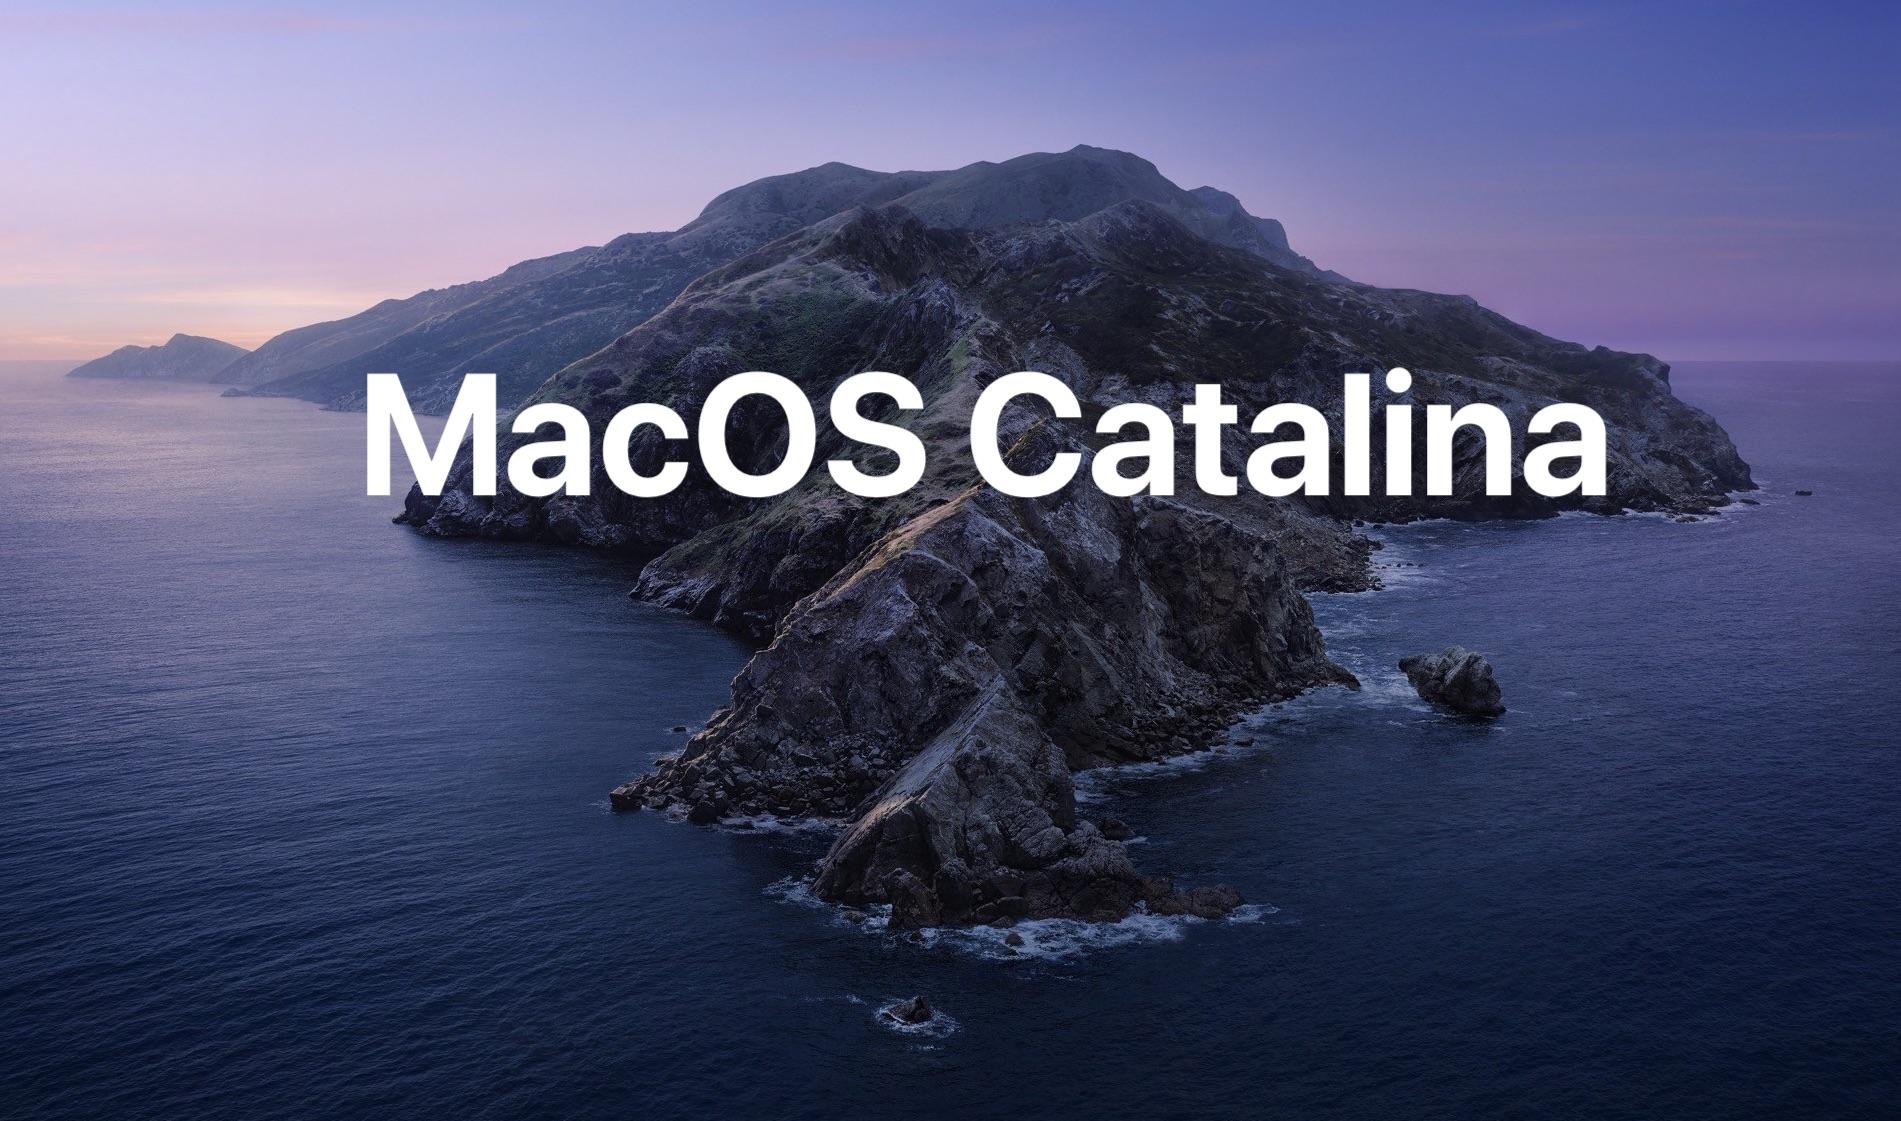 Actualización complementaria revisada de MacOS Catalina publicada